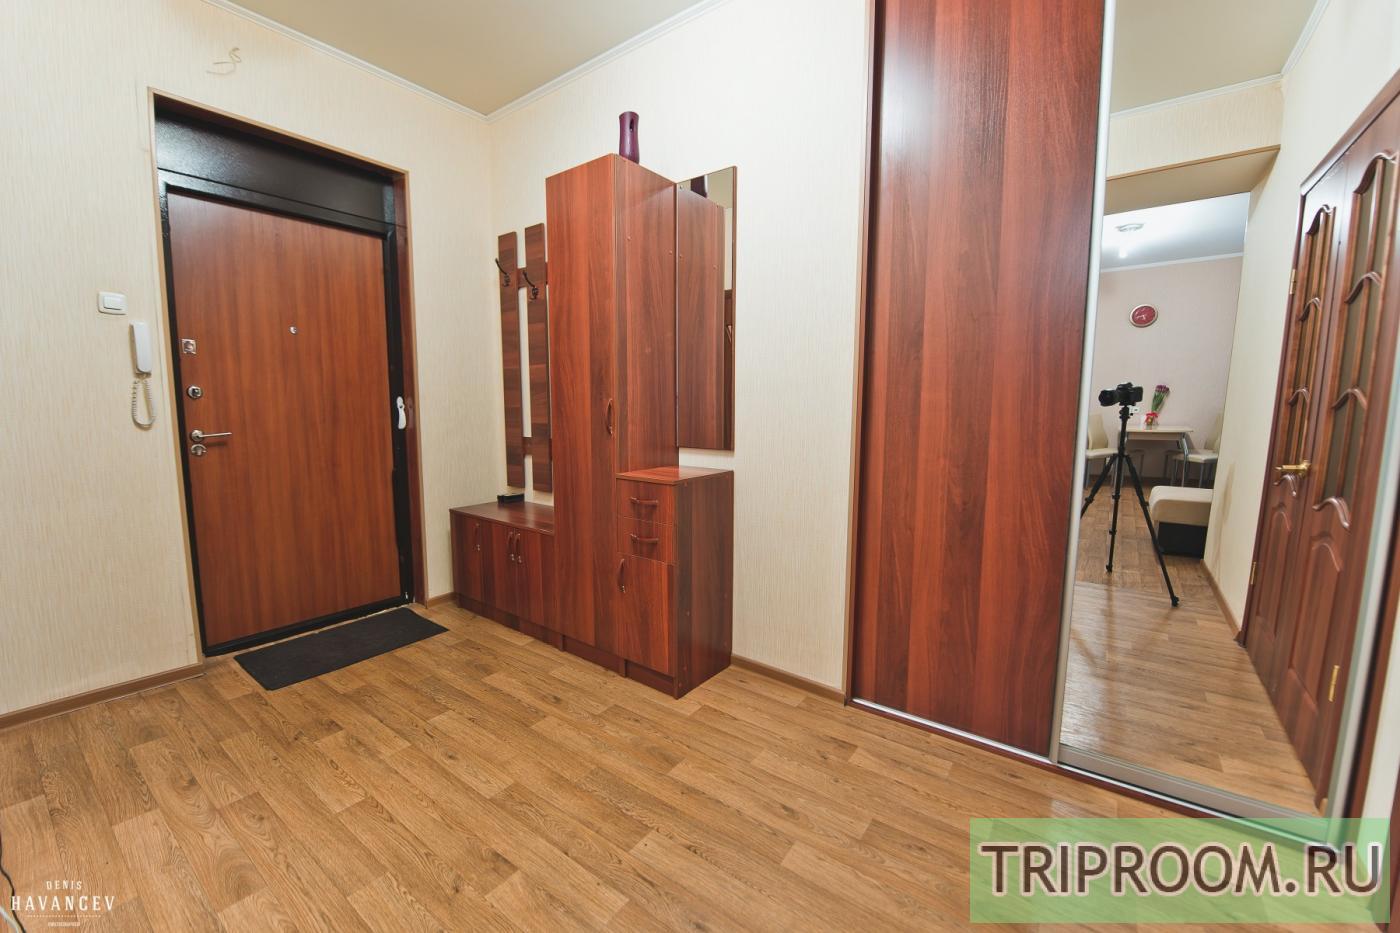 1-комнатная квартира посуточно (вариант № 14832), ул. Пугачева улица, фото № 11